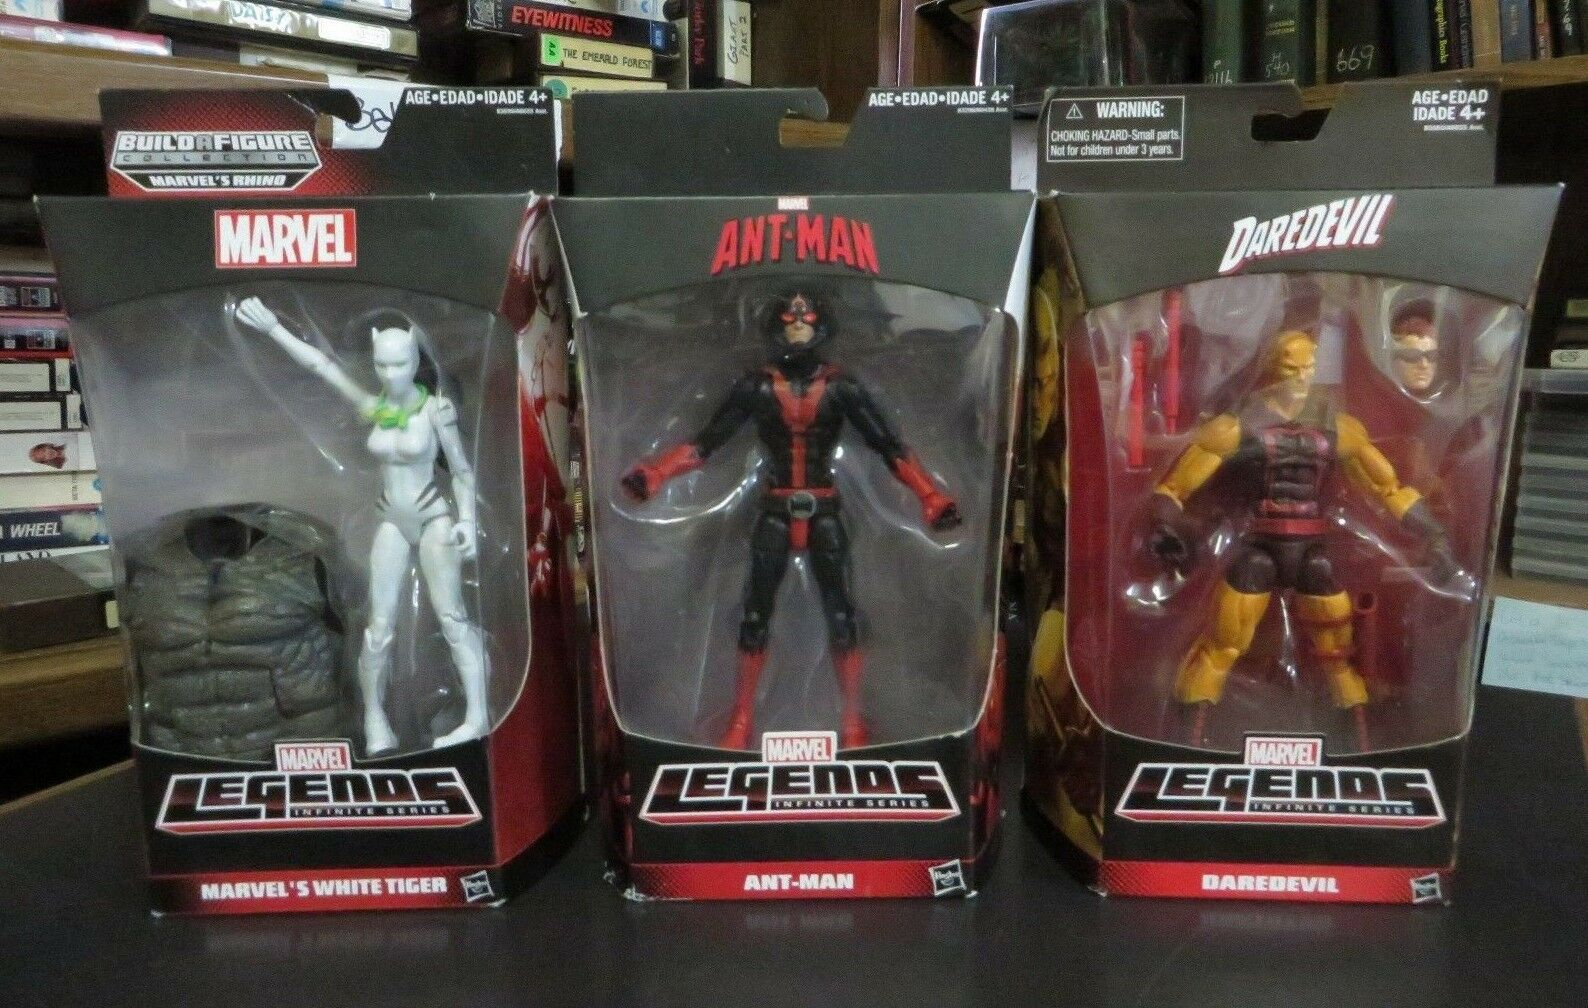 Lot of 3 Marvel  Legends Infinite  Series Figures, Darougeevil Ant-Man blanc Tiger  magasin discount